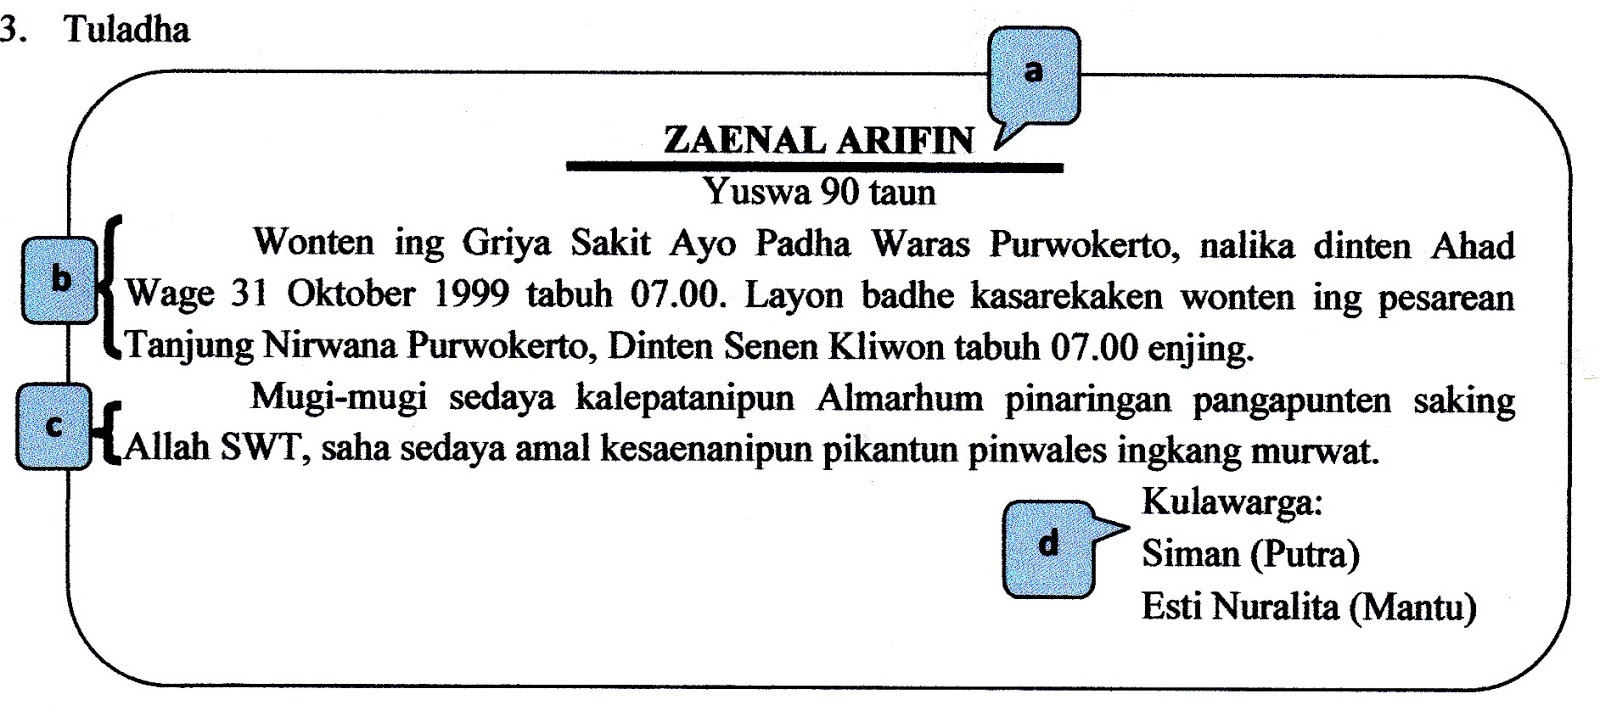 Kumpulan Contoh Karangan Persuasi Bahasa Jawa  Contoh Tuladha Wacana Bahasa Jawa Naskahkutk